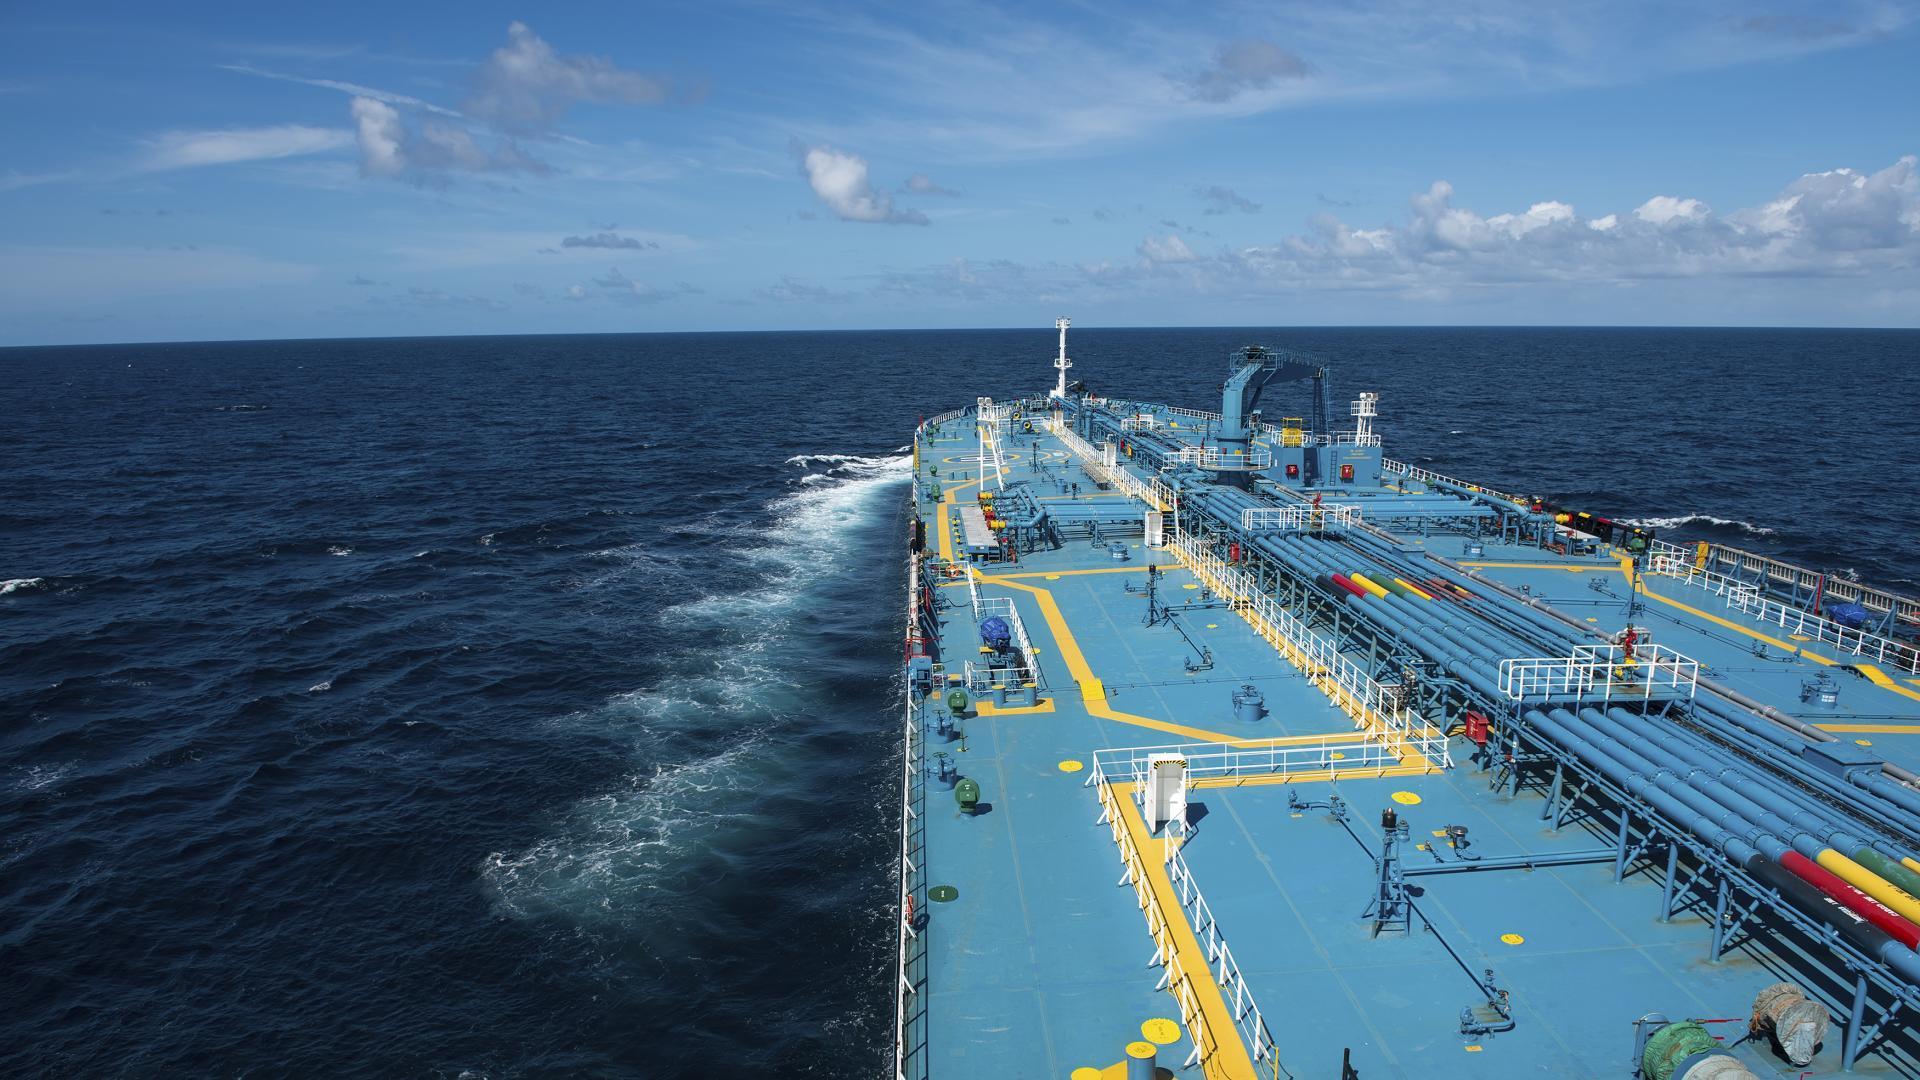 CroppedFocusedImage1920108056-40-ship-tanker3